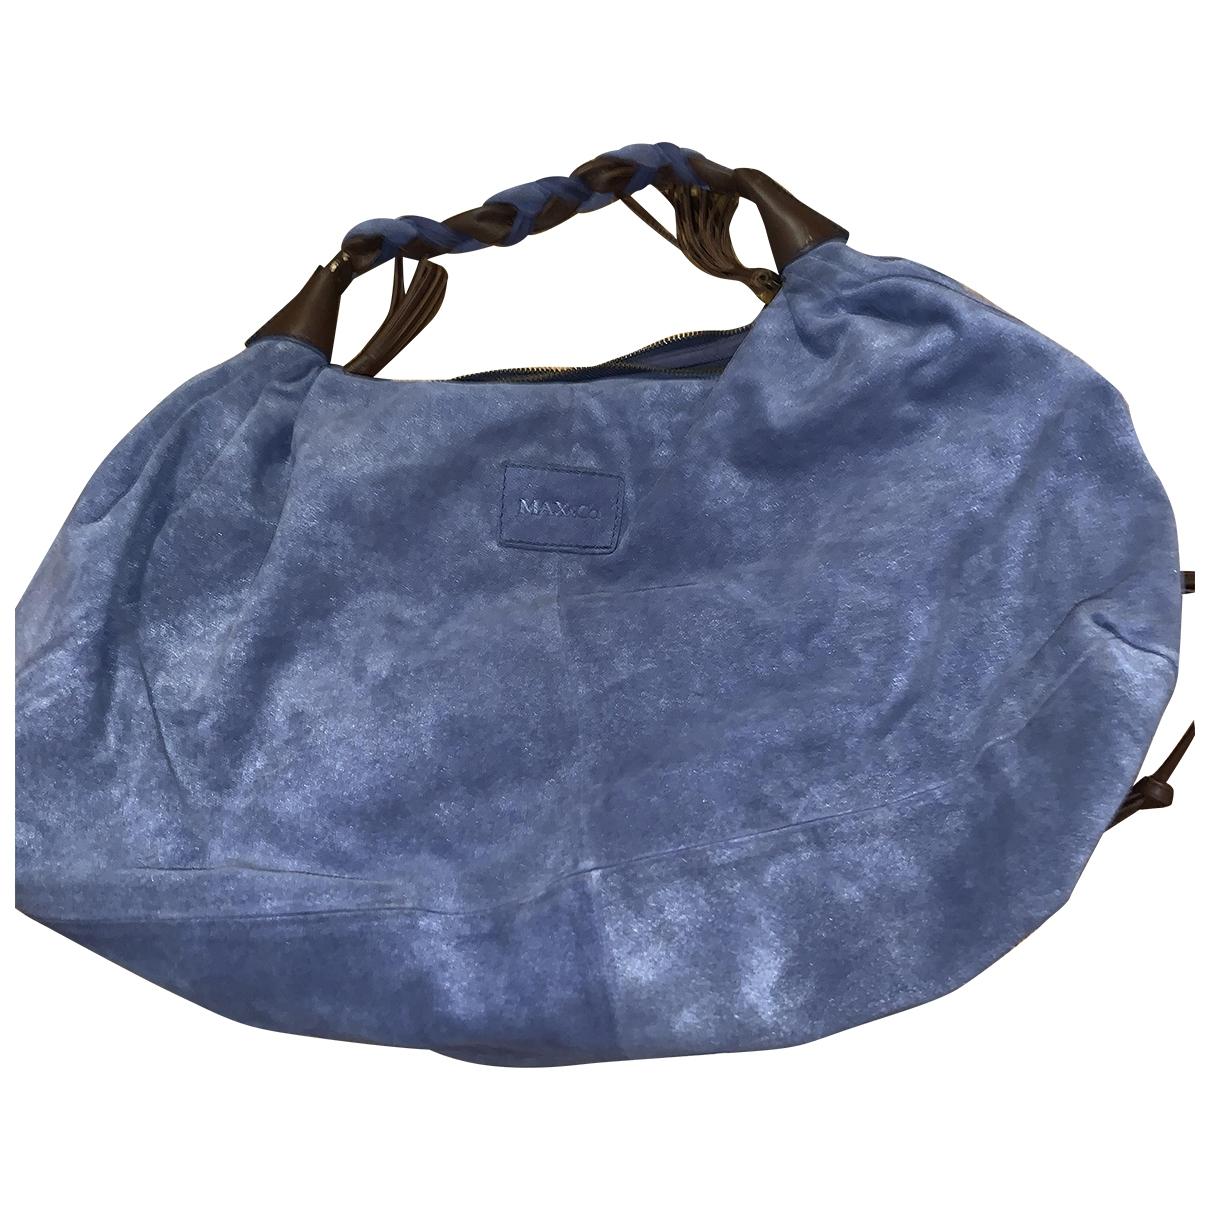 Max & Co \N Leather handbag for Women \N